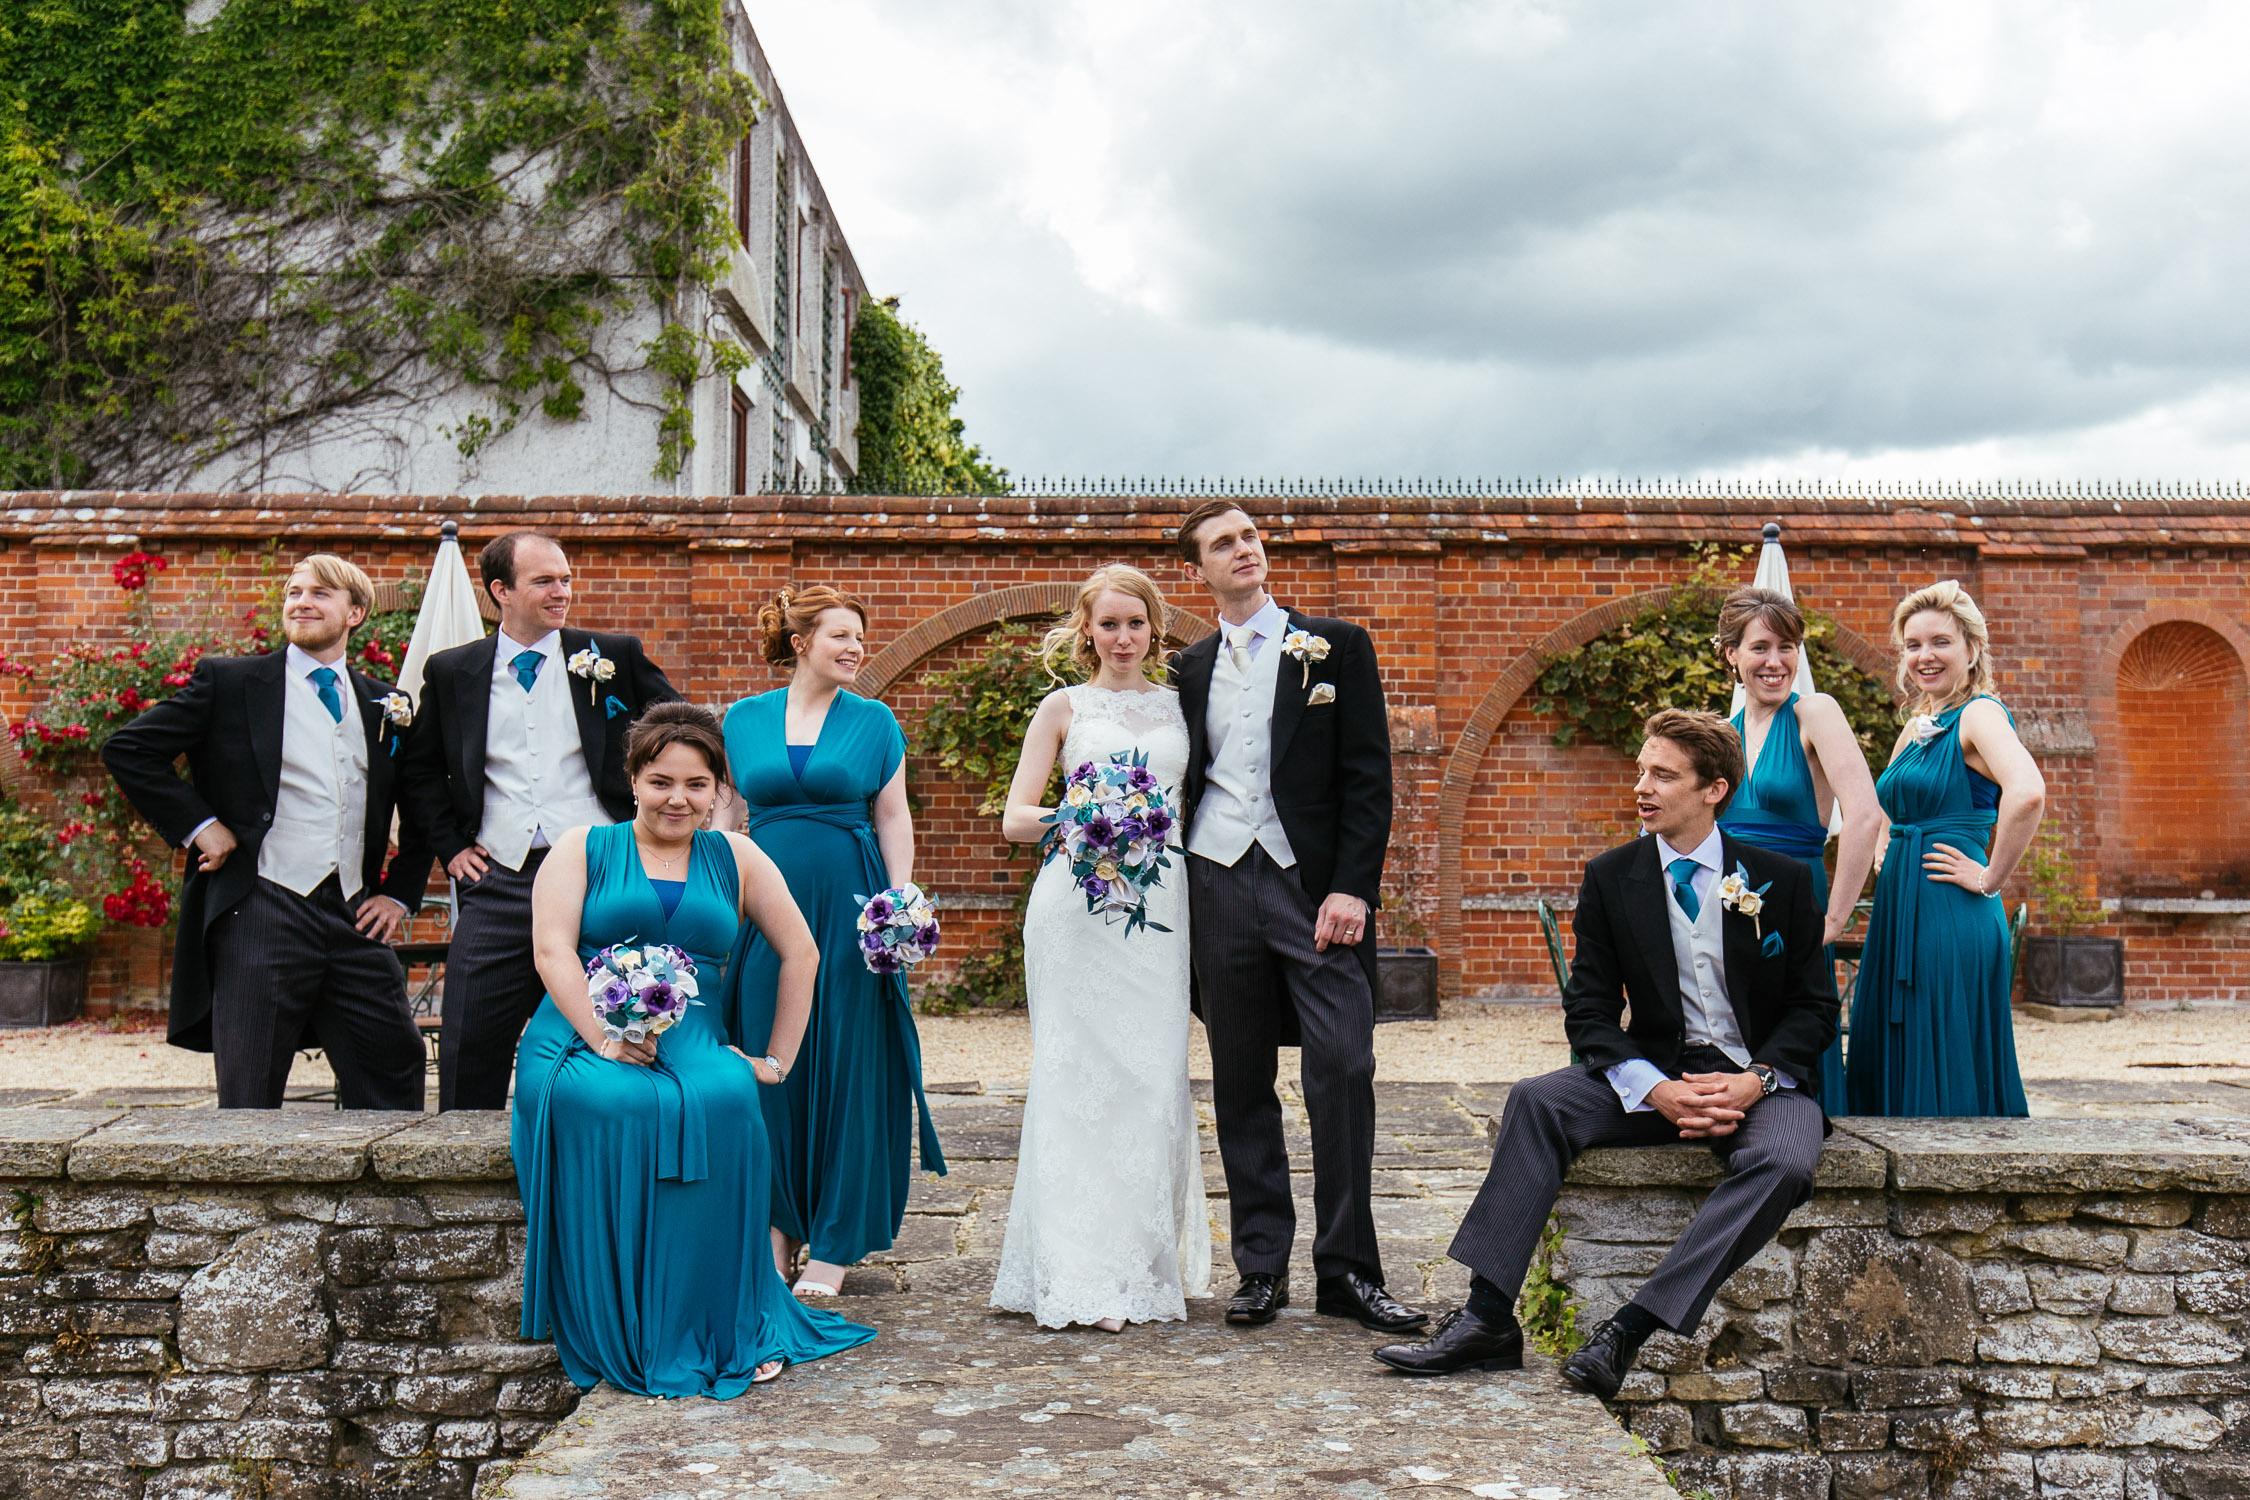 Lizi-and-Mark-Wedding-Highlights-56.jpg